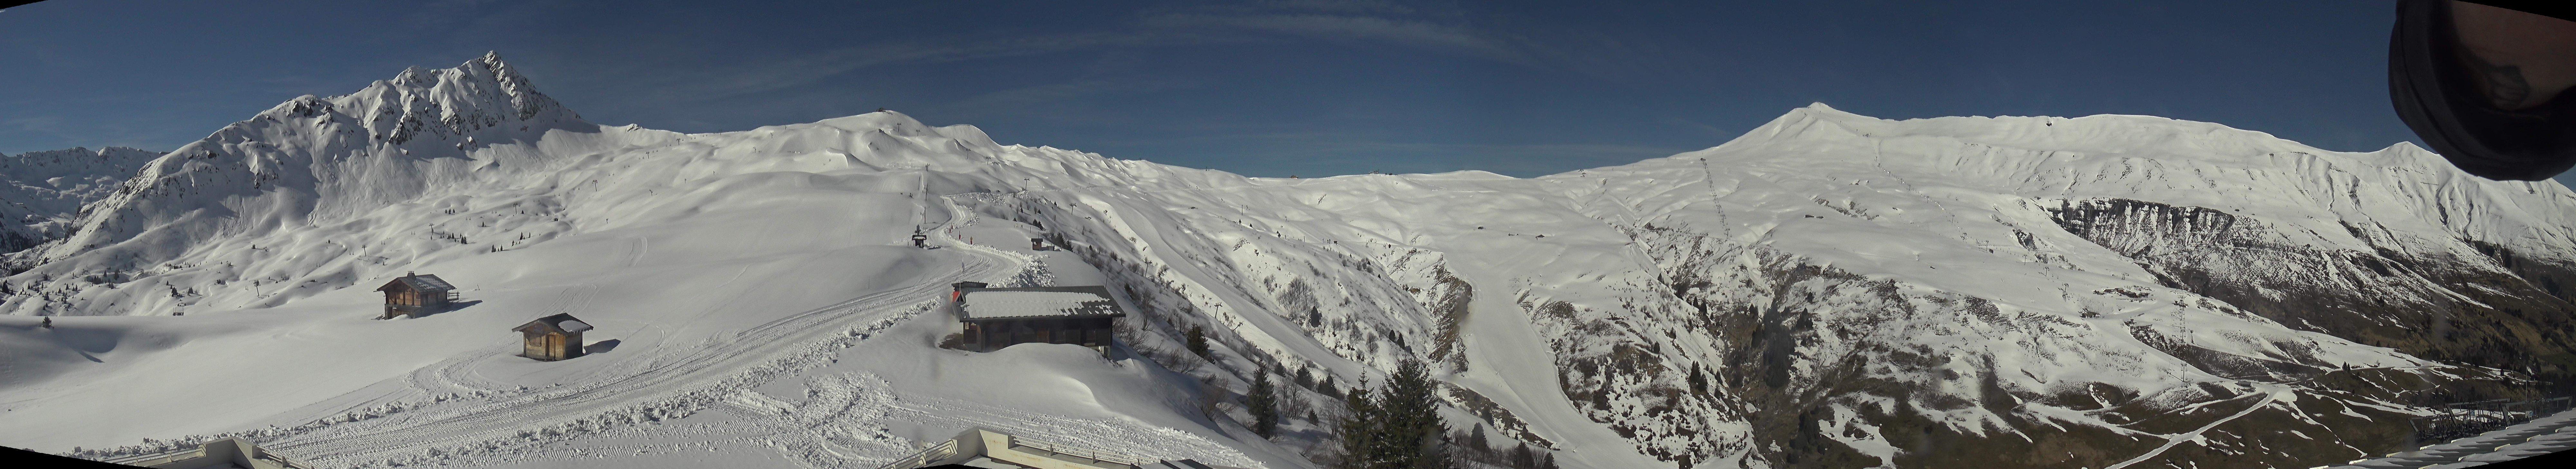 Les Contamines - Col du Joly ski station